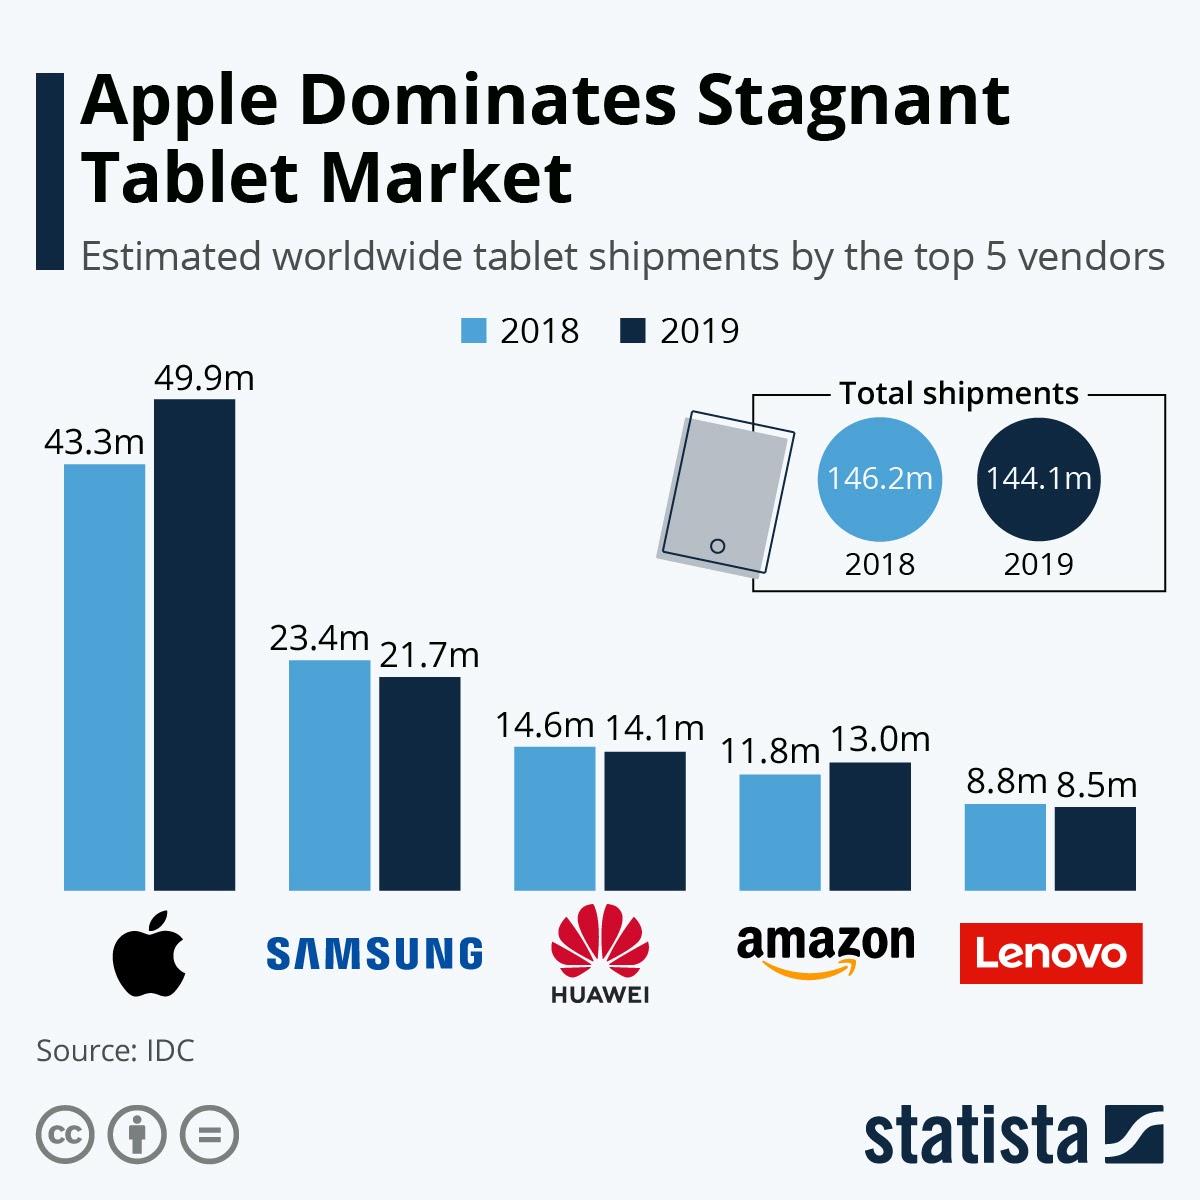 apple-dominates-stagnant-tablet-market-infographic